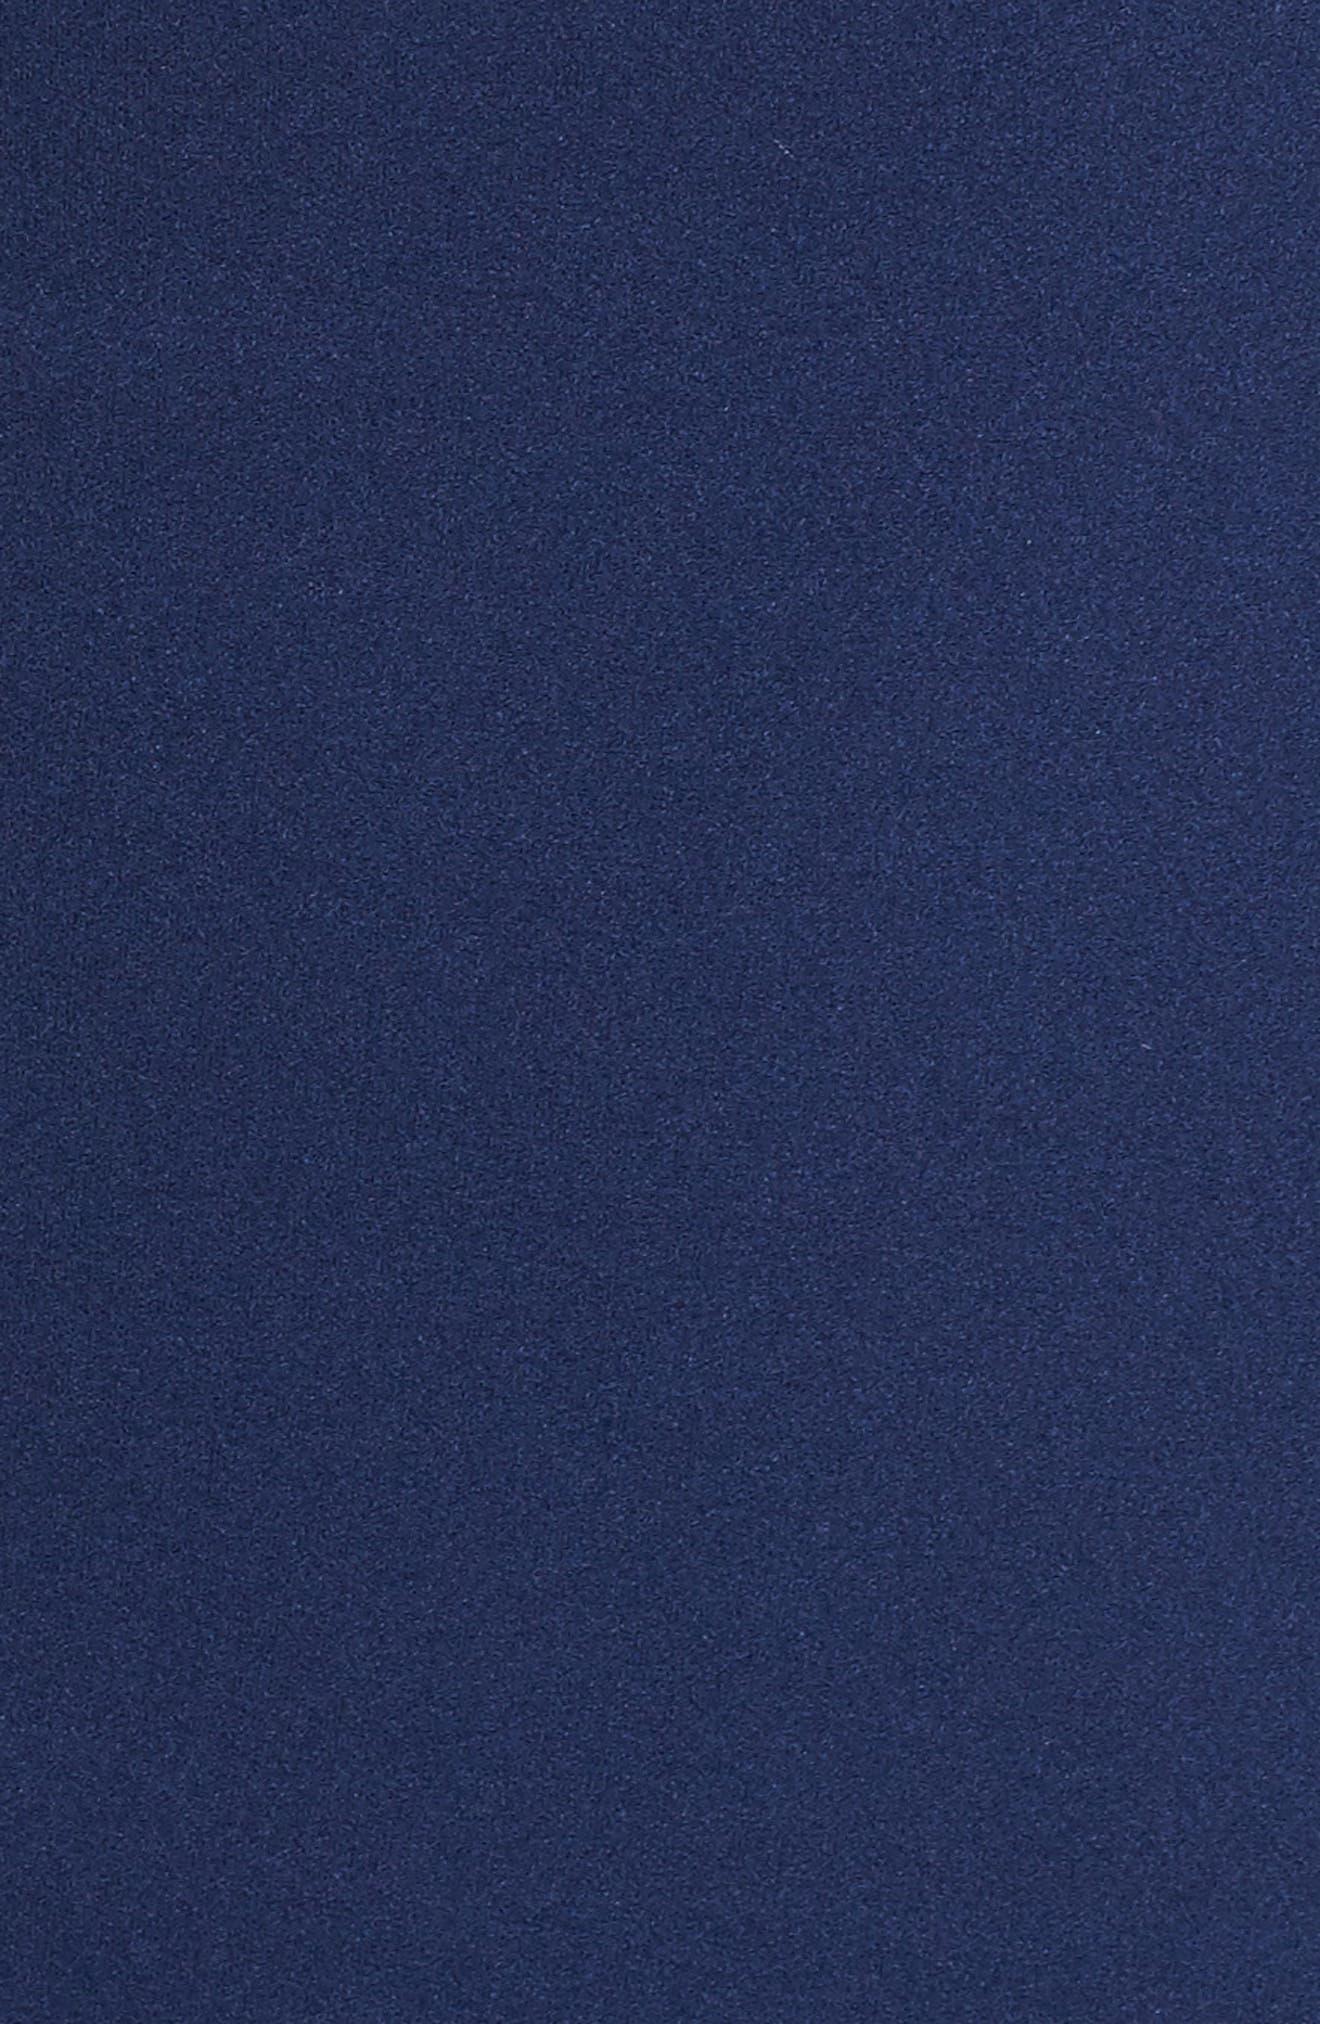 Cold Shoulder Sheath Dress,                             Alternate thumbnail 5, color,                             Navy Sateen